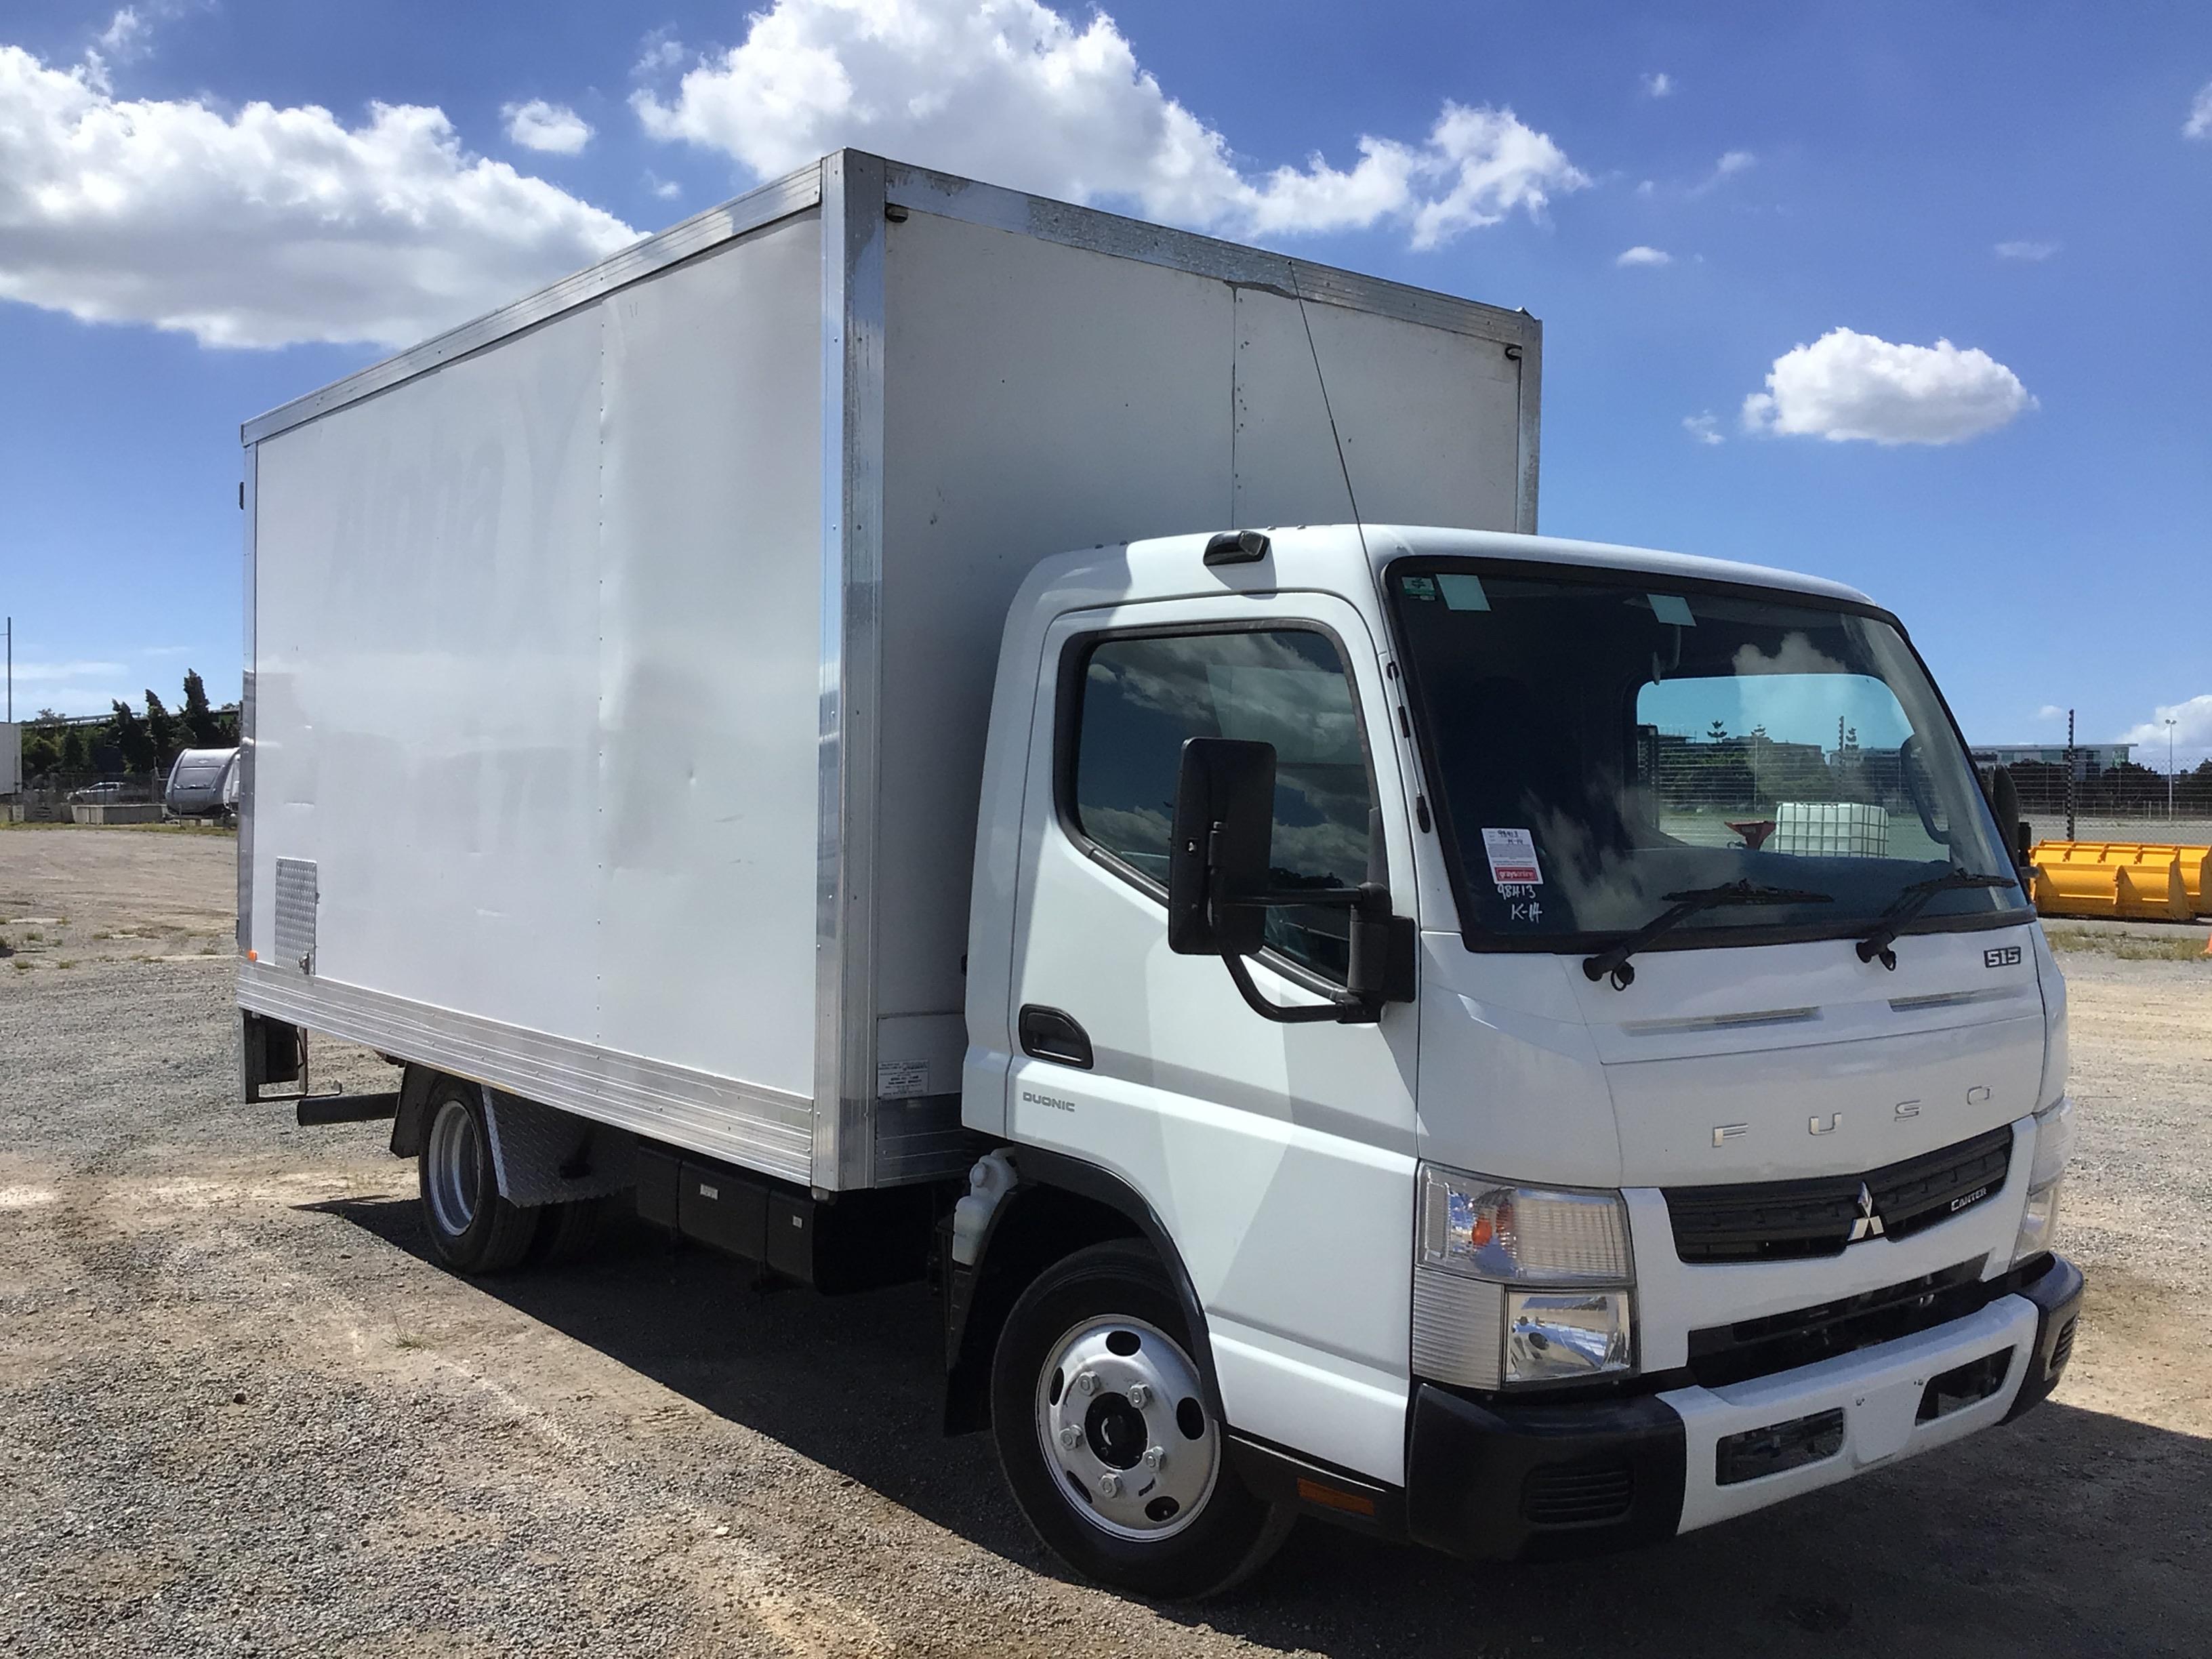 2015 Mitsubishi Fuso Canter 515 Auto Pantech Truck Tailgate Loader